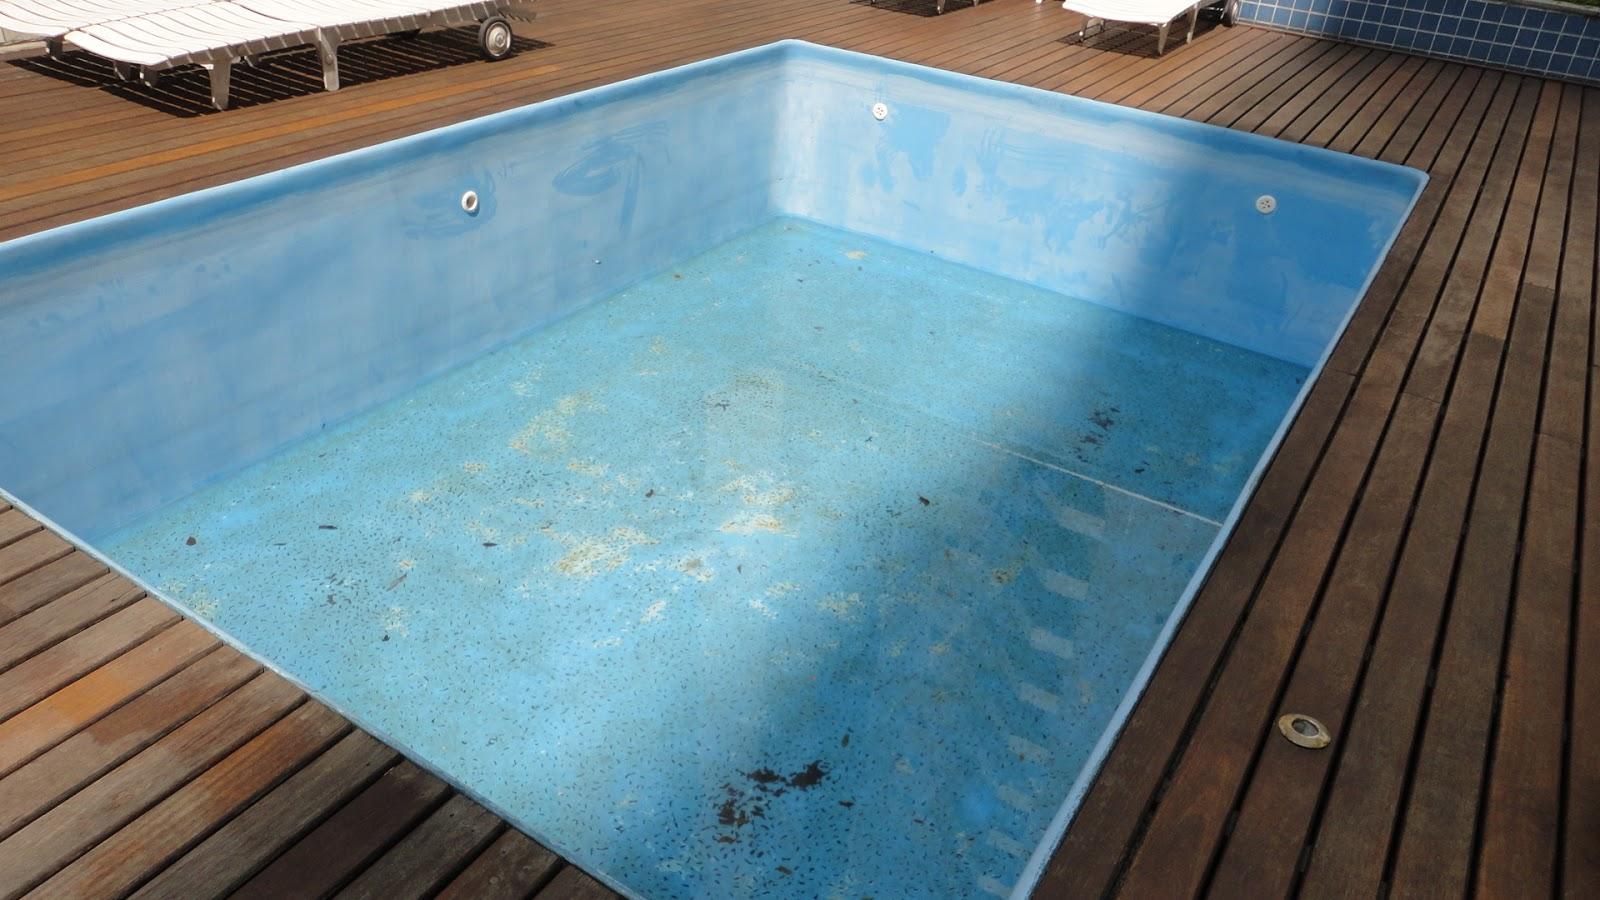 Cooper fibra banheiras reforma de piscina de fibra de vidro for Piscina de fibra 3 por 4